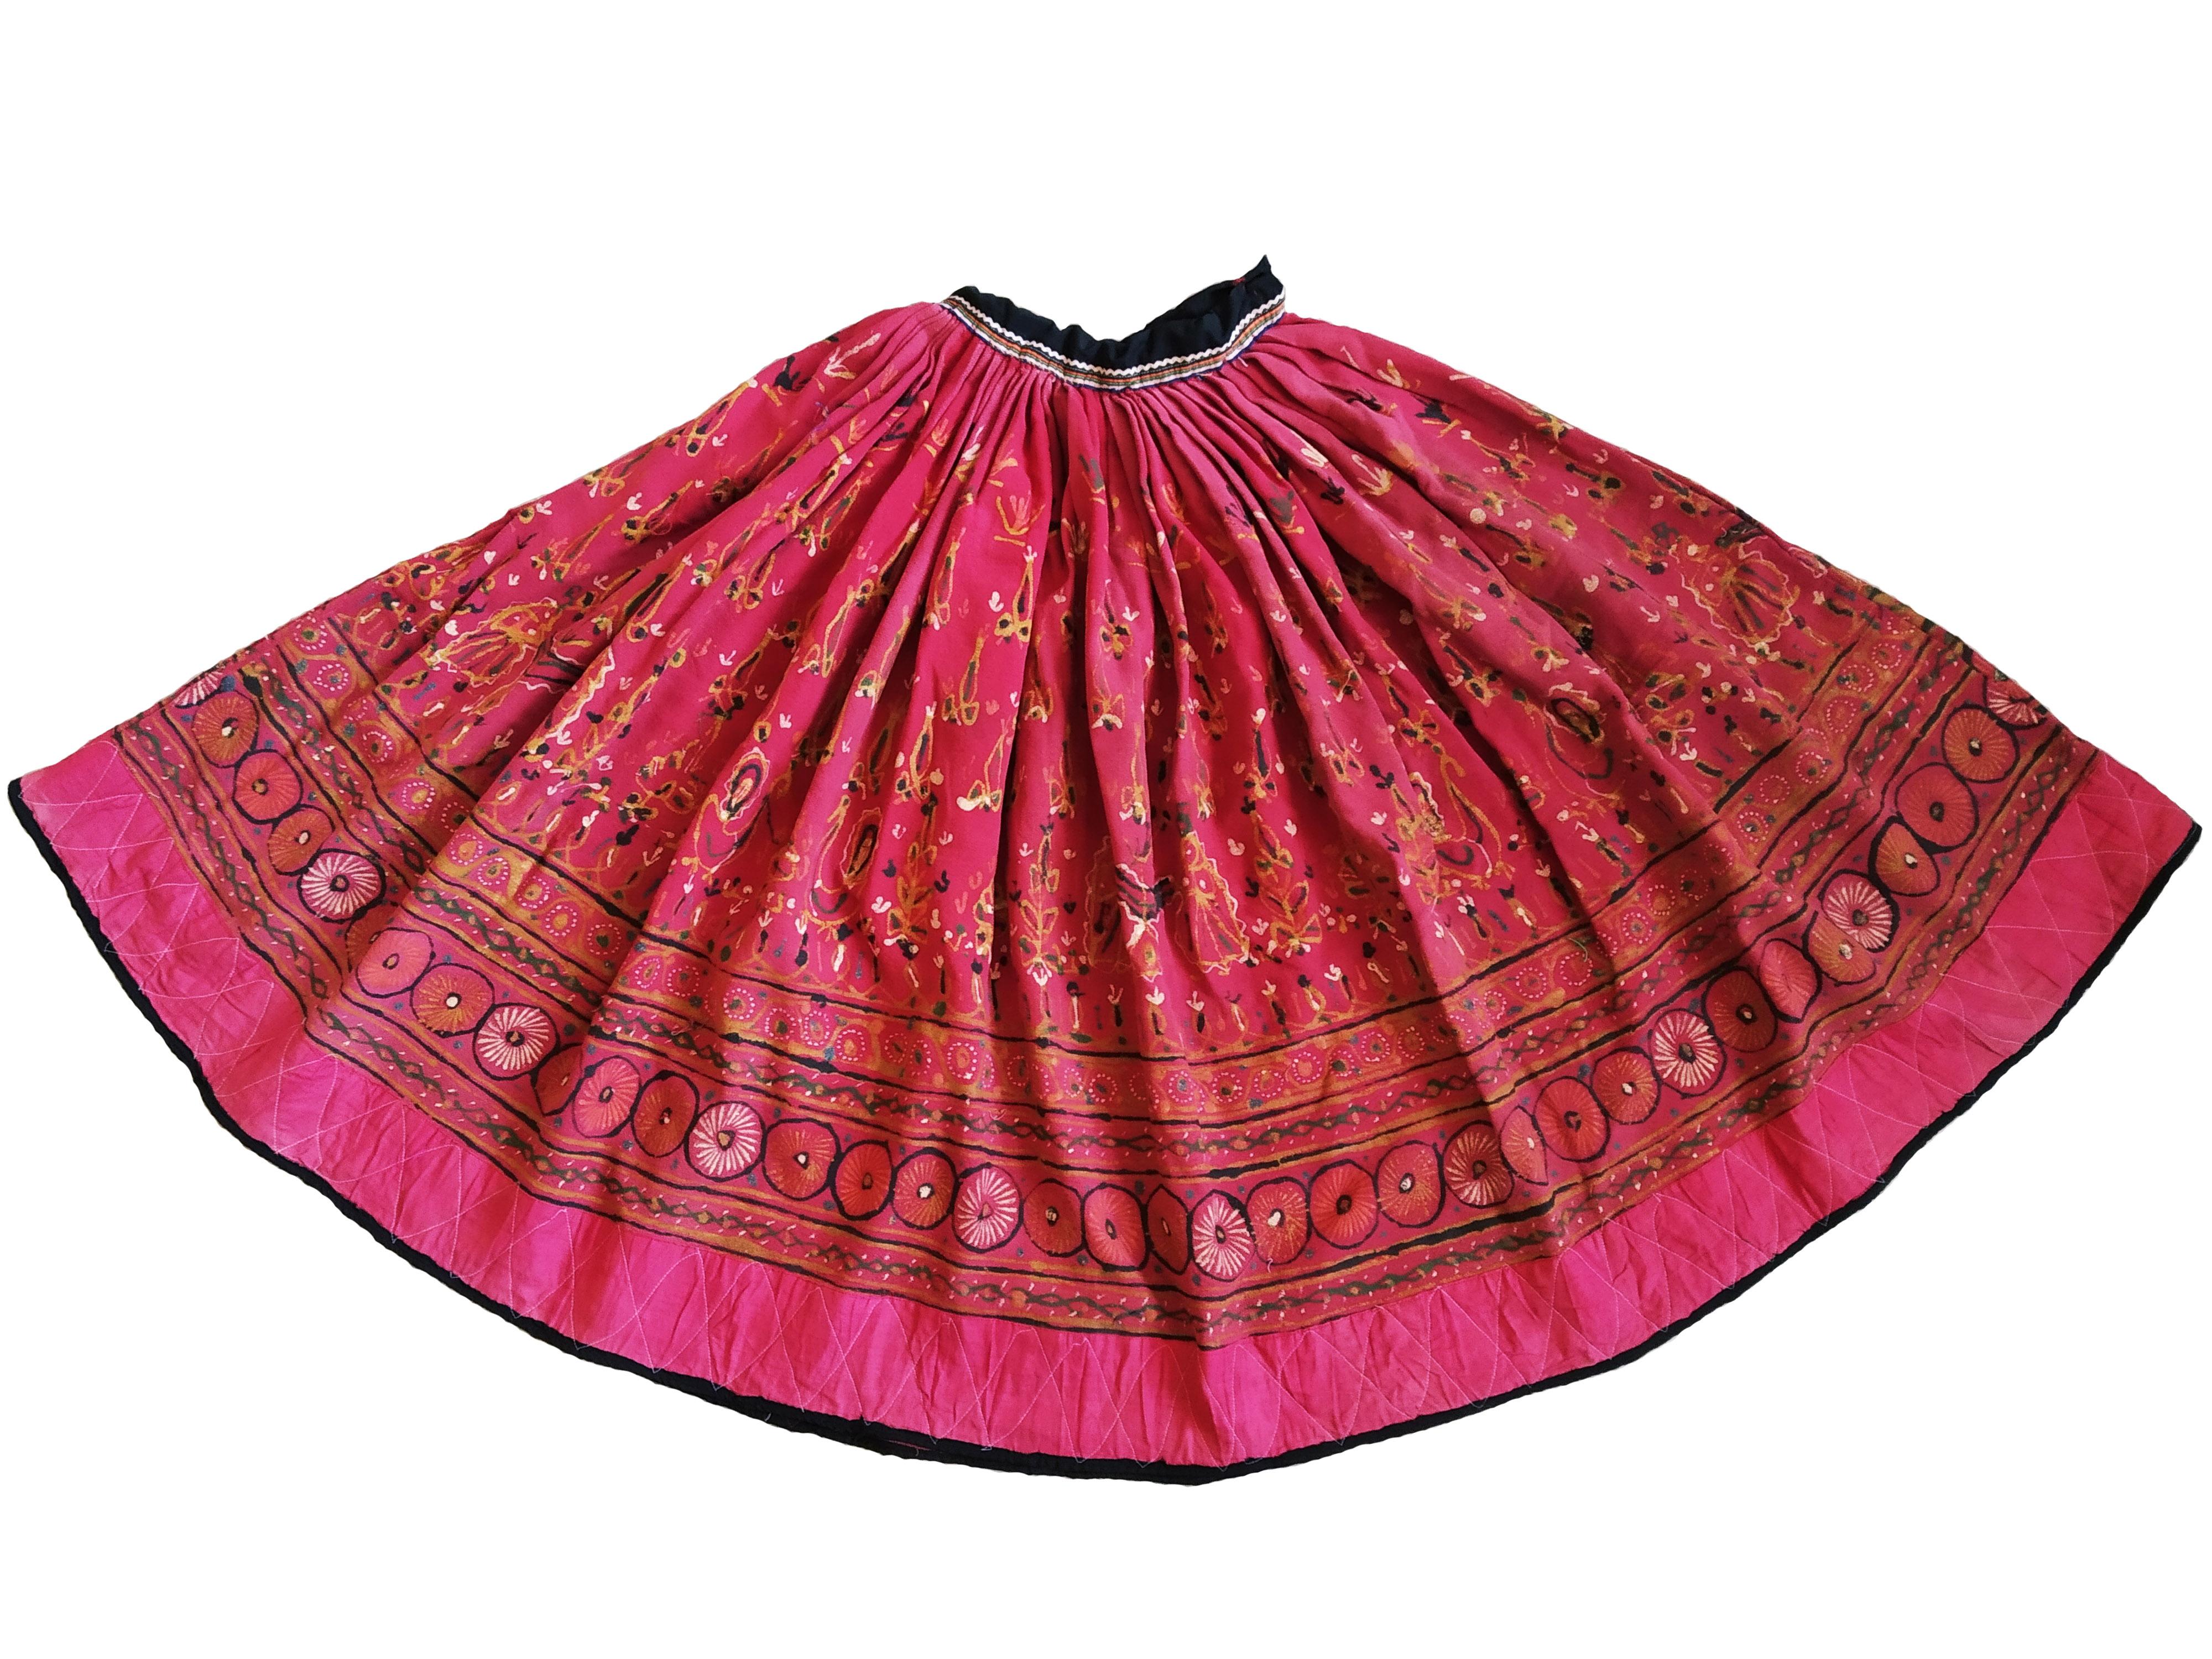 Chaniyo (Skirt), Ahir, 20th century, Kachachh (Gujarat), Rogan work, stitched, Lt. 83 cm (including the waistband); Lt. 393 cm (hemline). Collection: Sushmit Sharma.